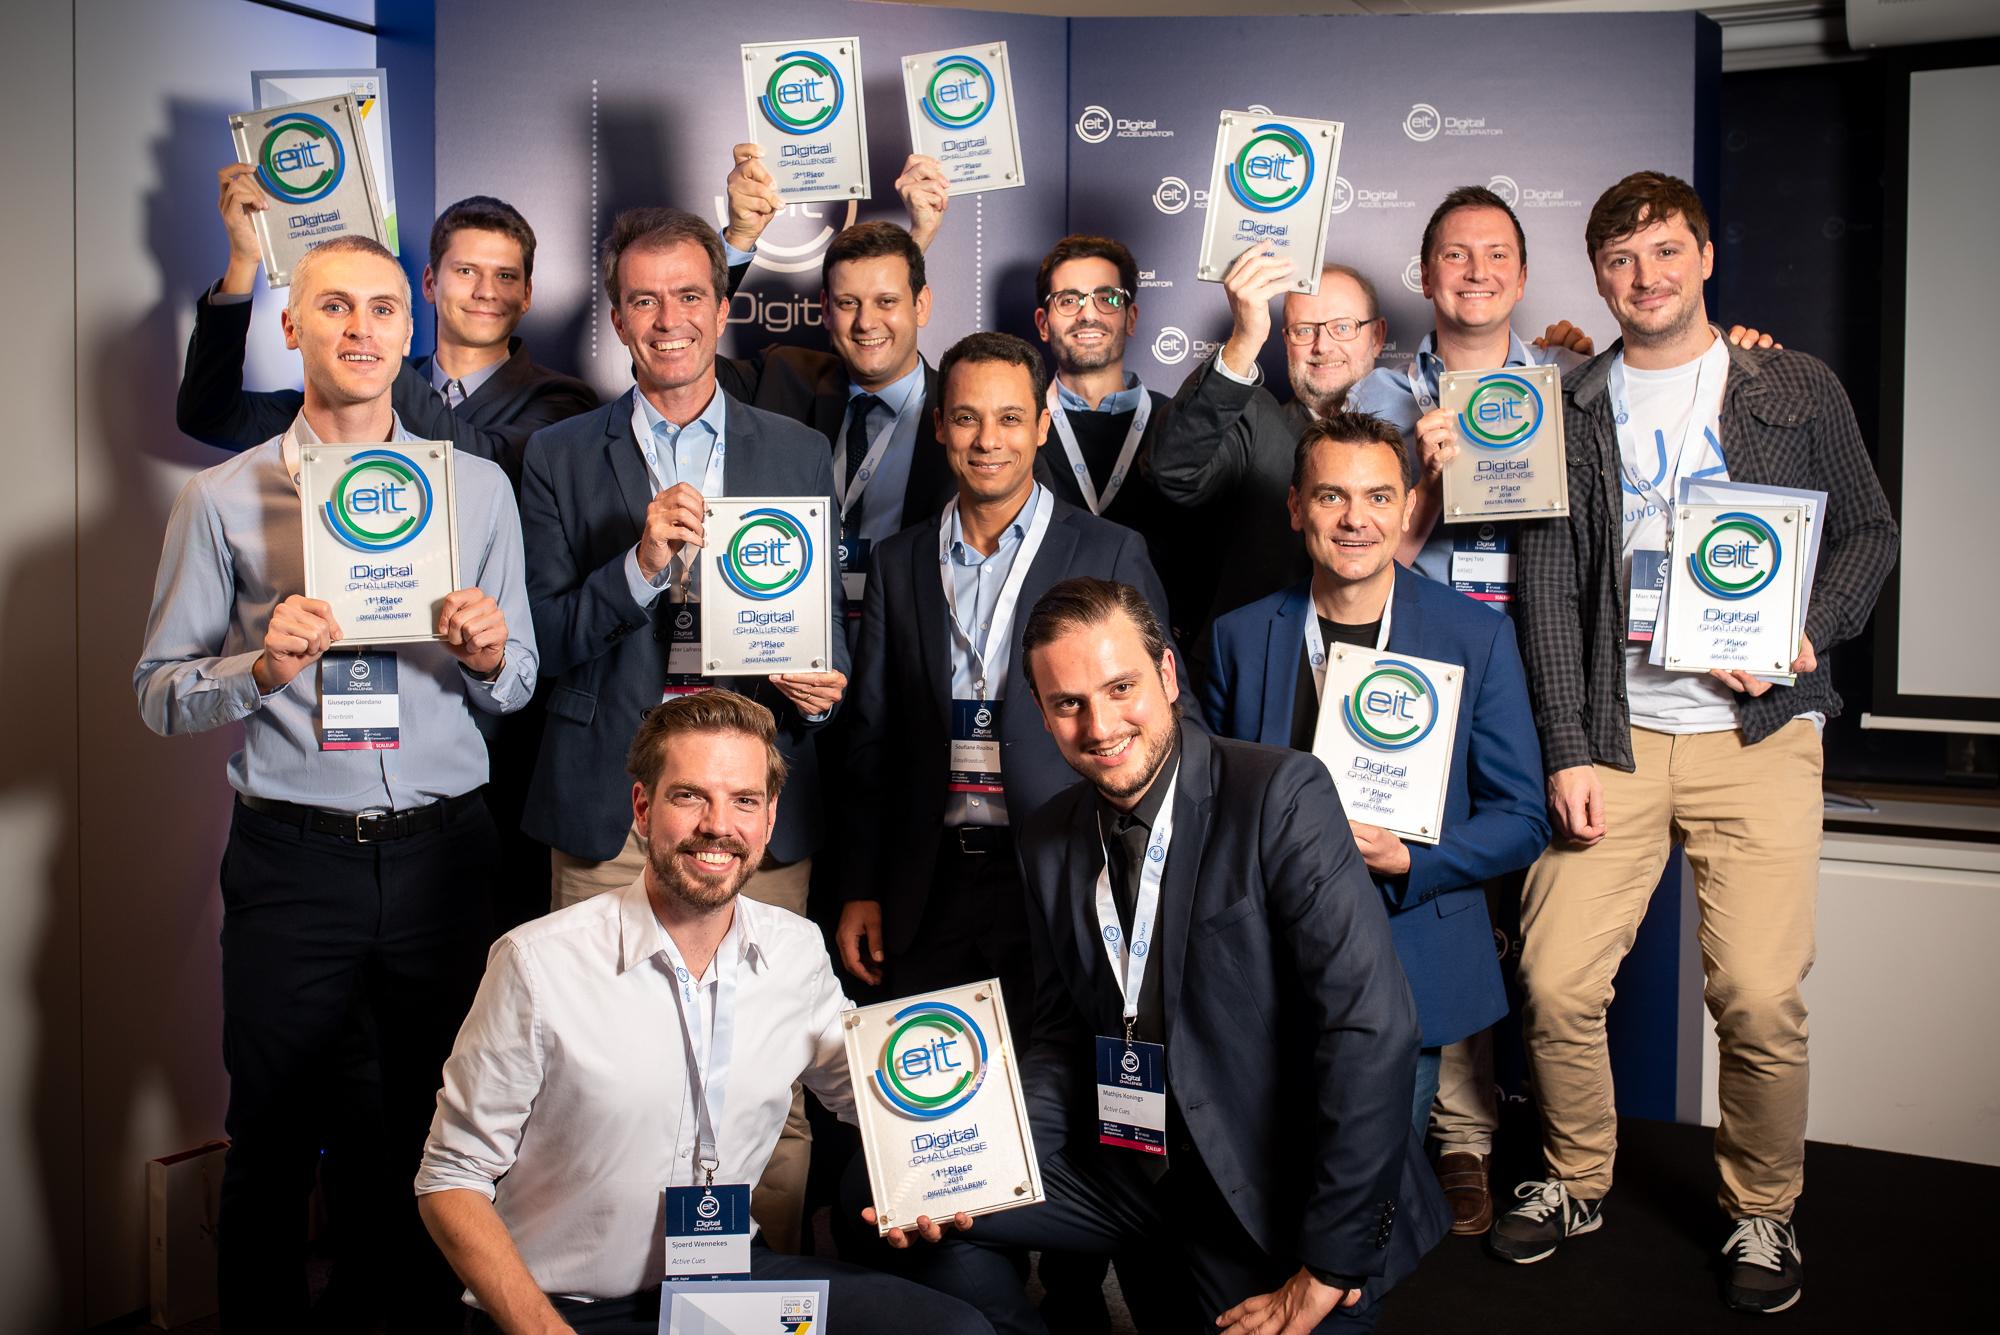 EIT Digital Challenge Winners 2018